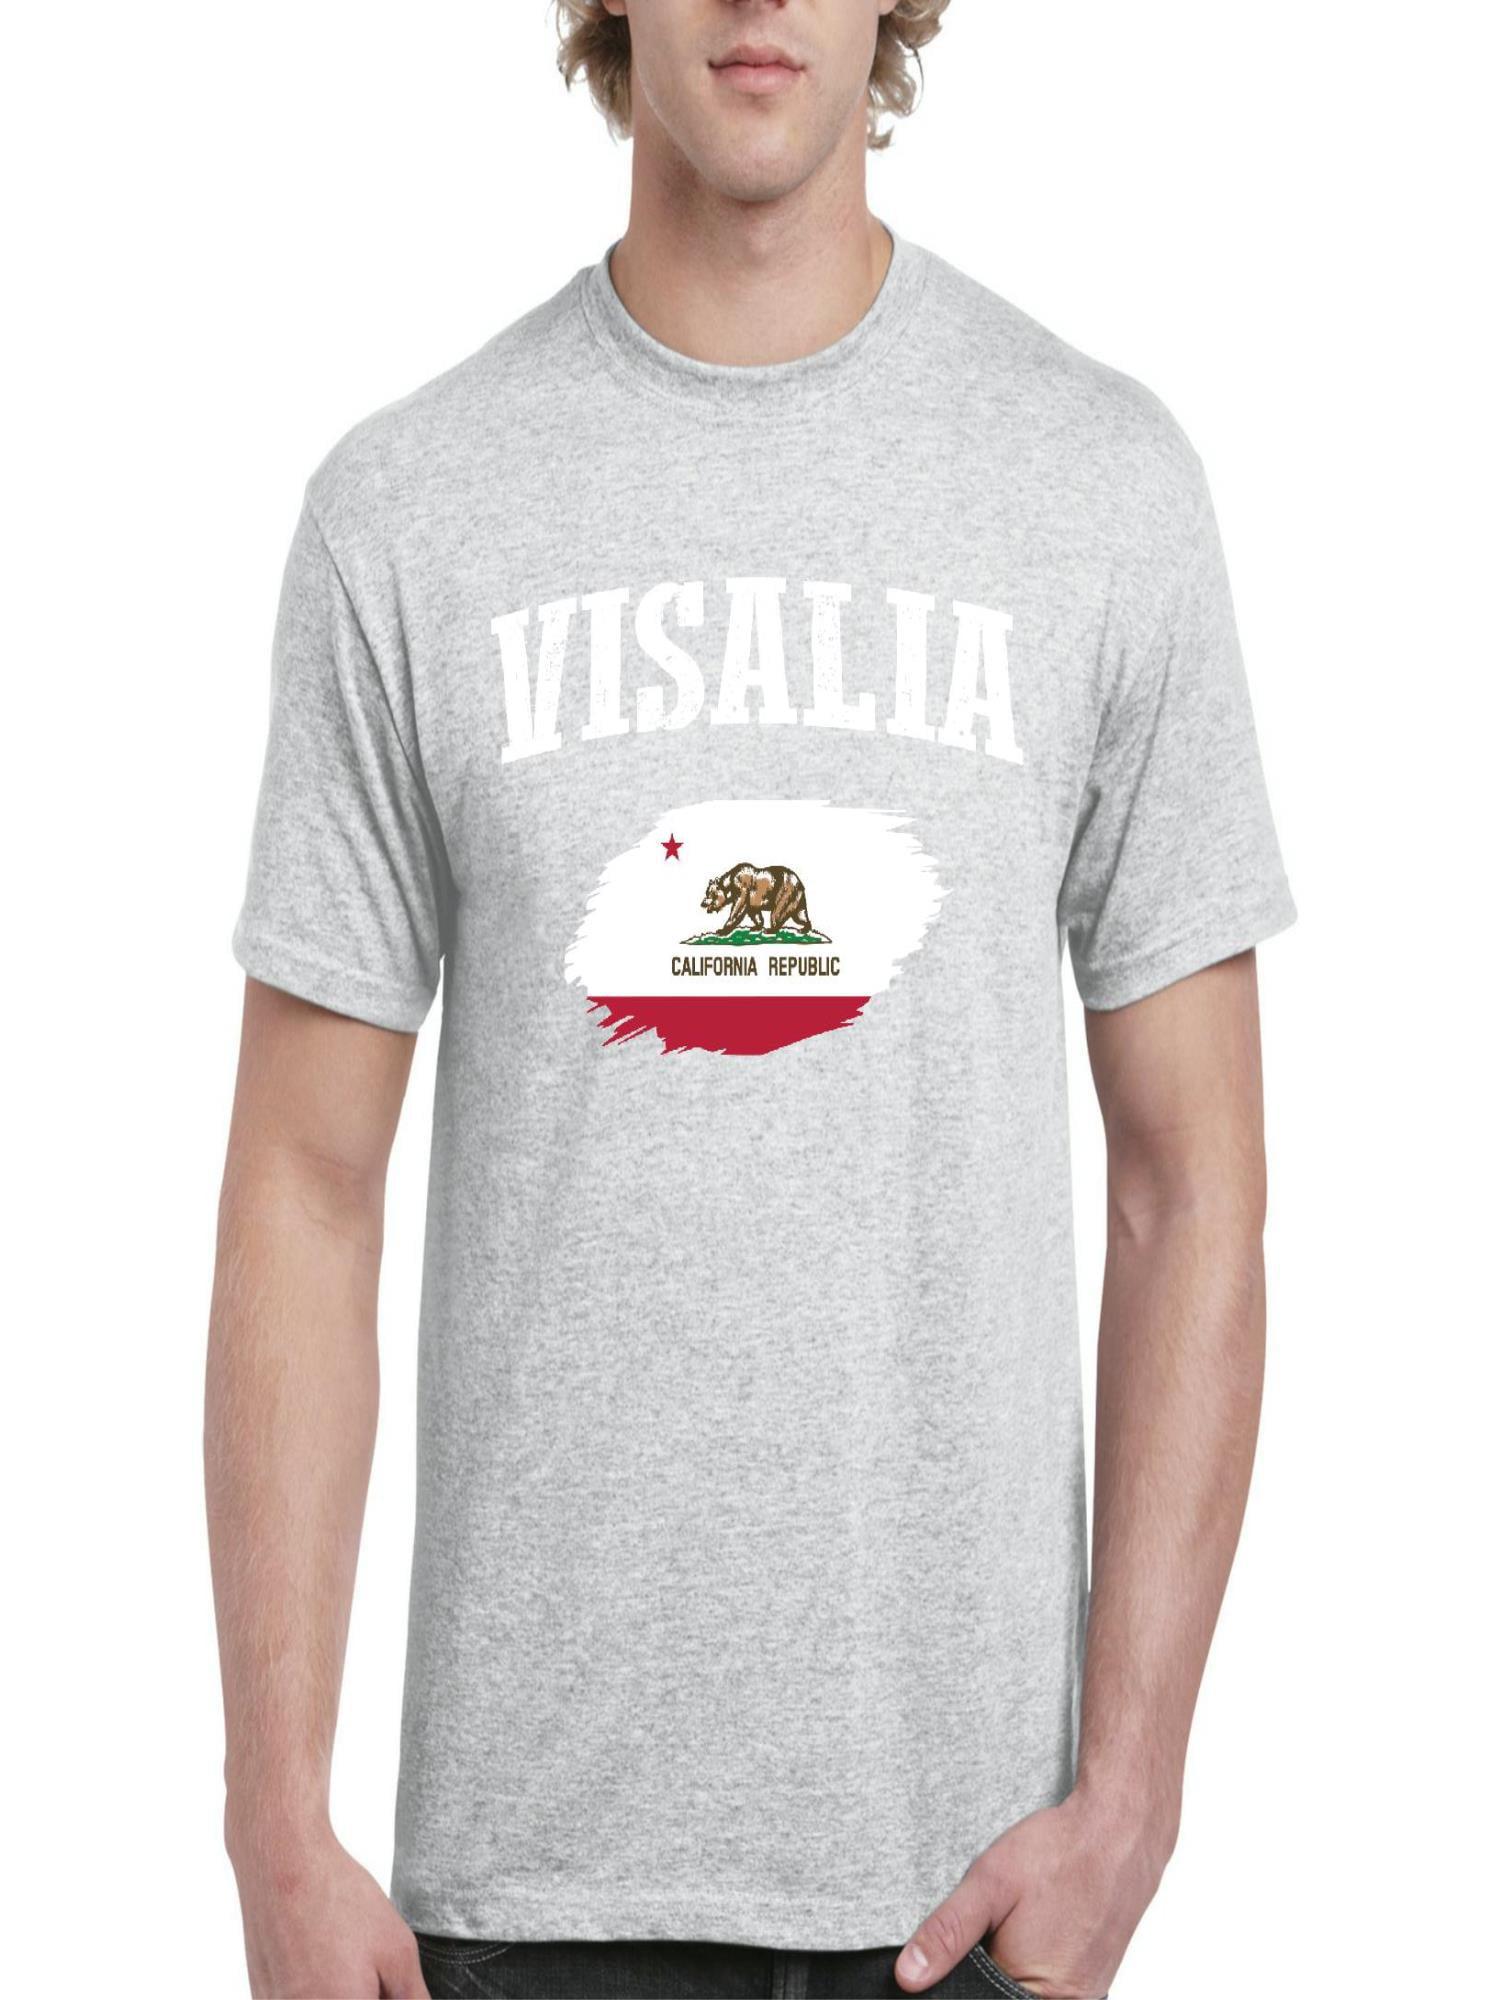 Visalia California Men Shirts T Shirt Tee Walmart